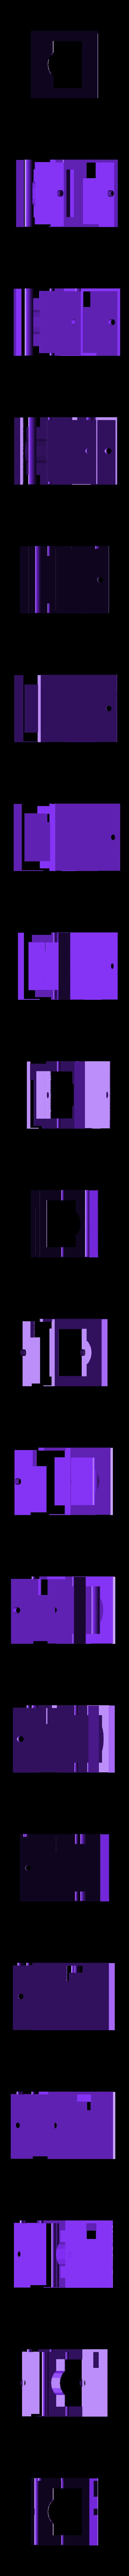 CASE-PrintLikeThis.stl Download free STL file Cyclops 3 - Box case • 3D printer design, Gophy